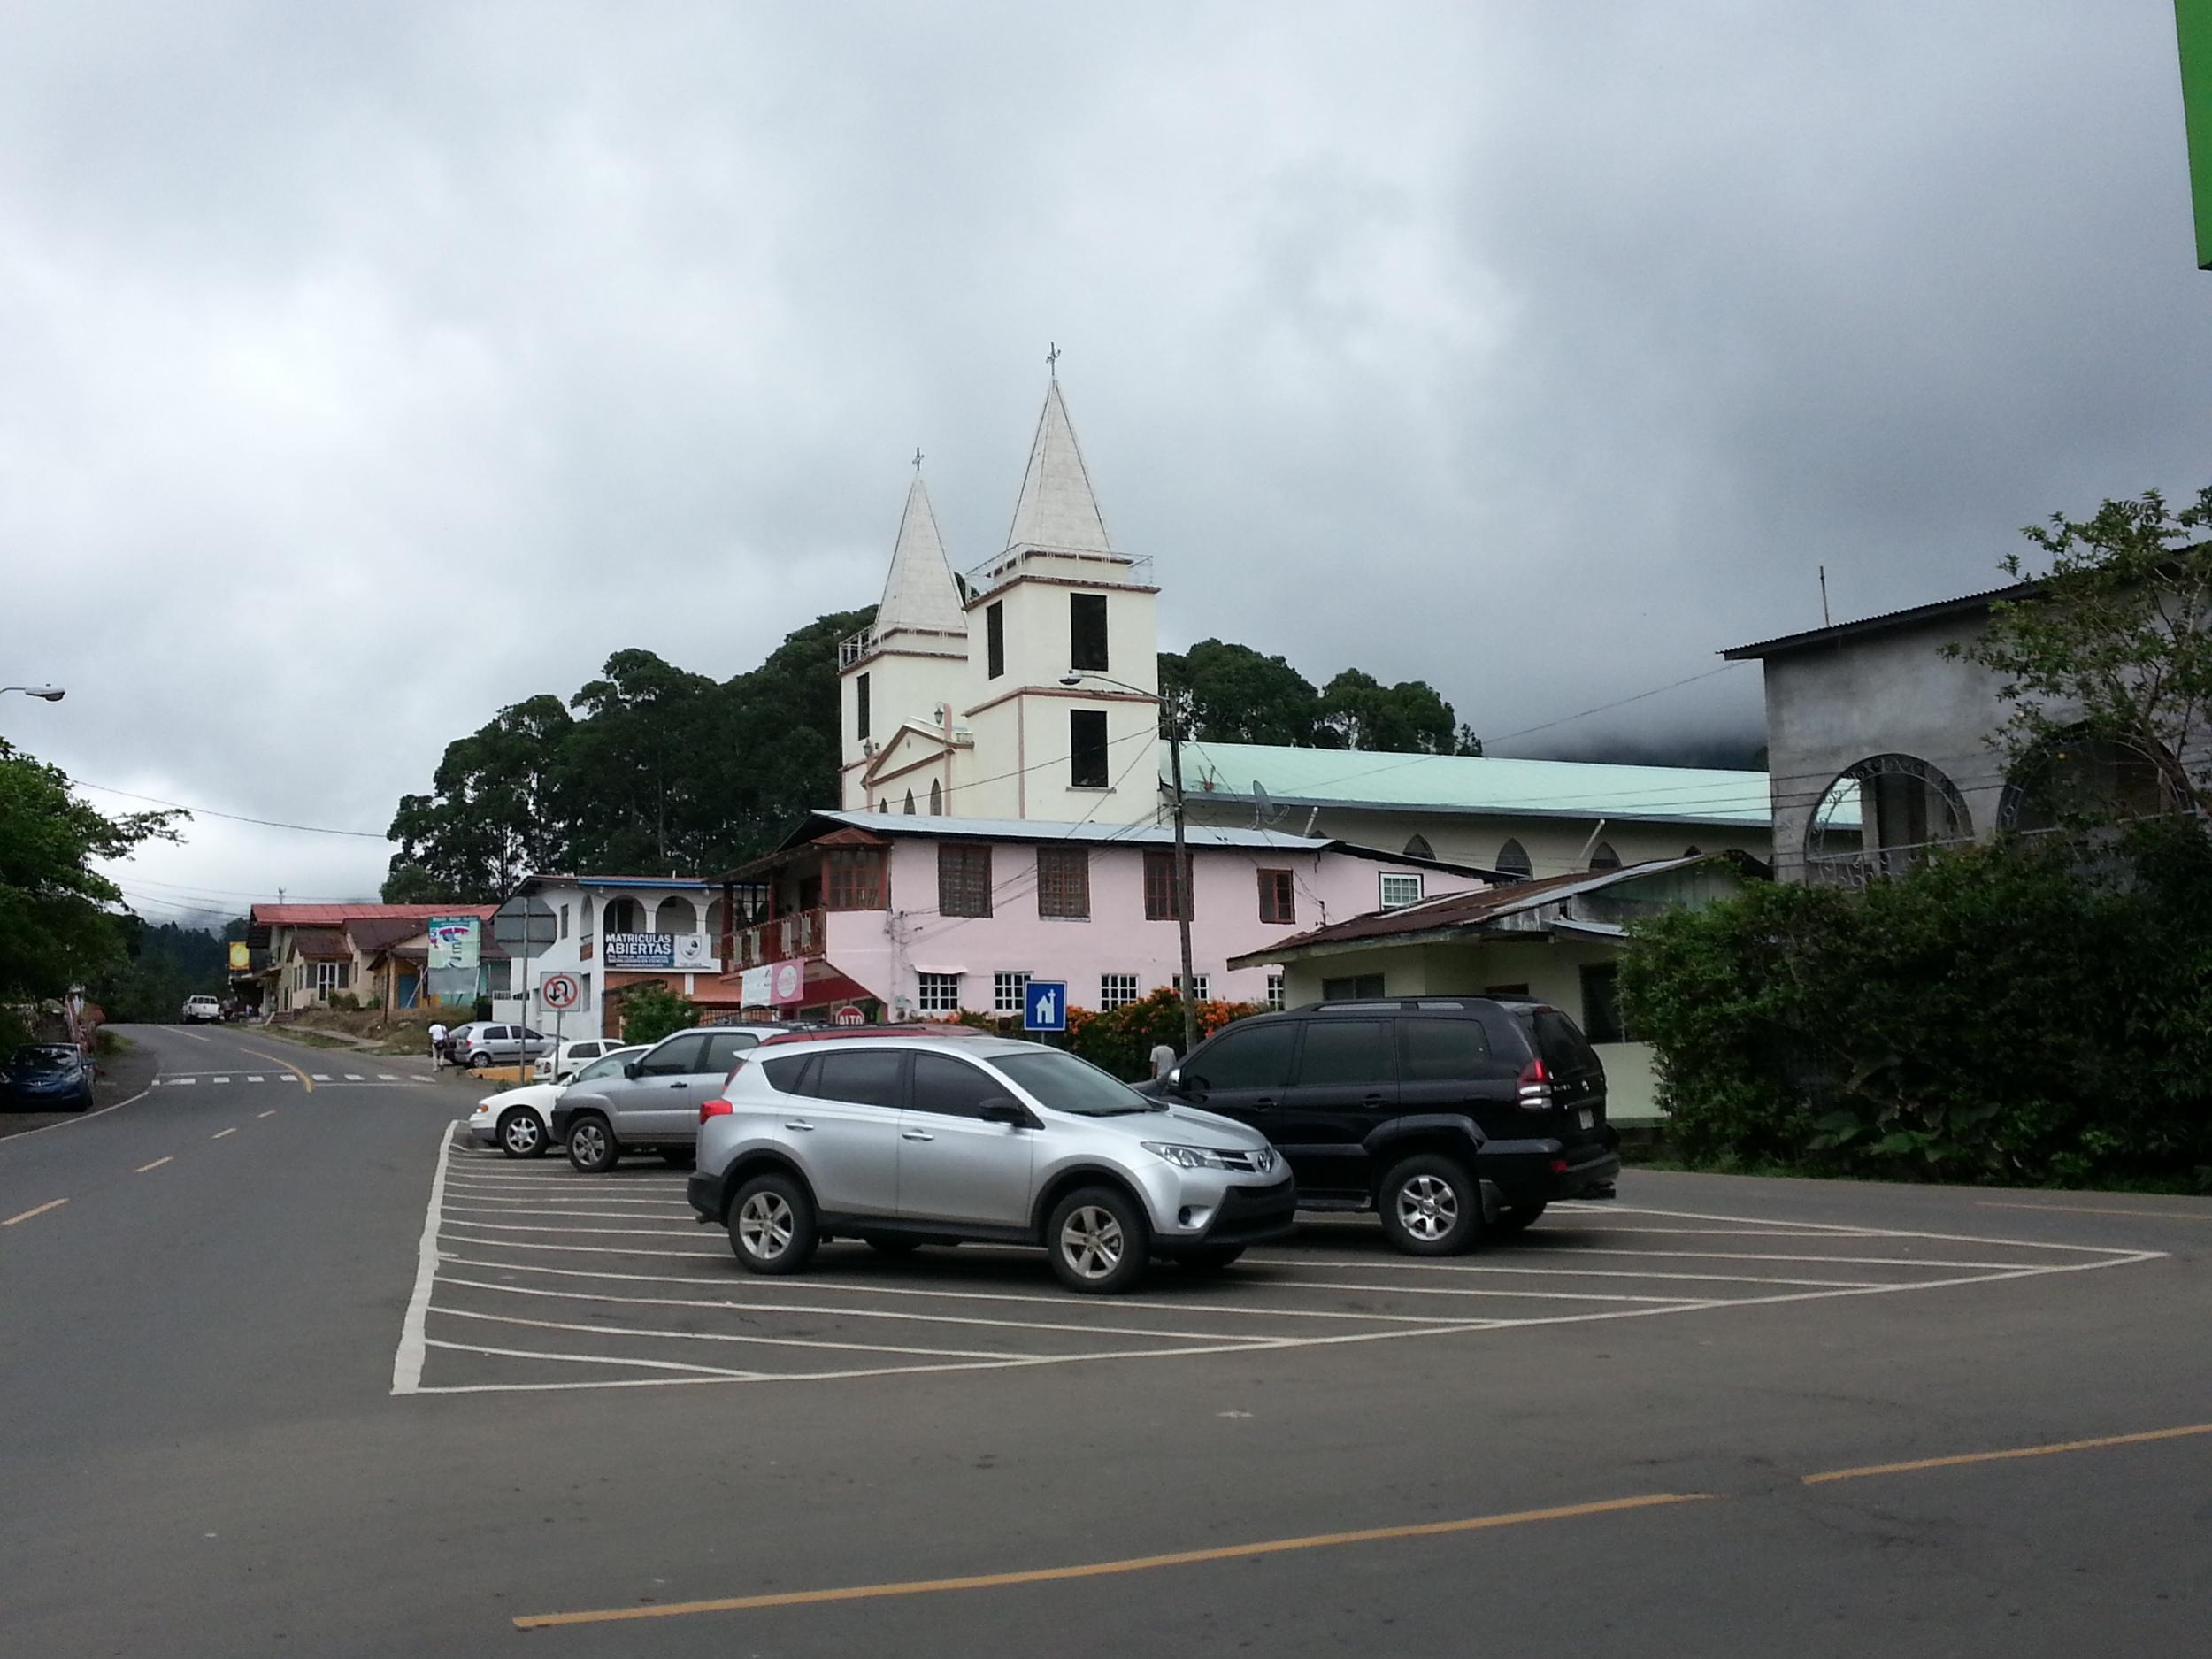 Boquete does have a church